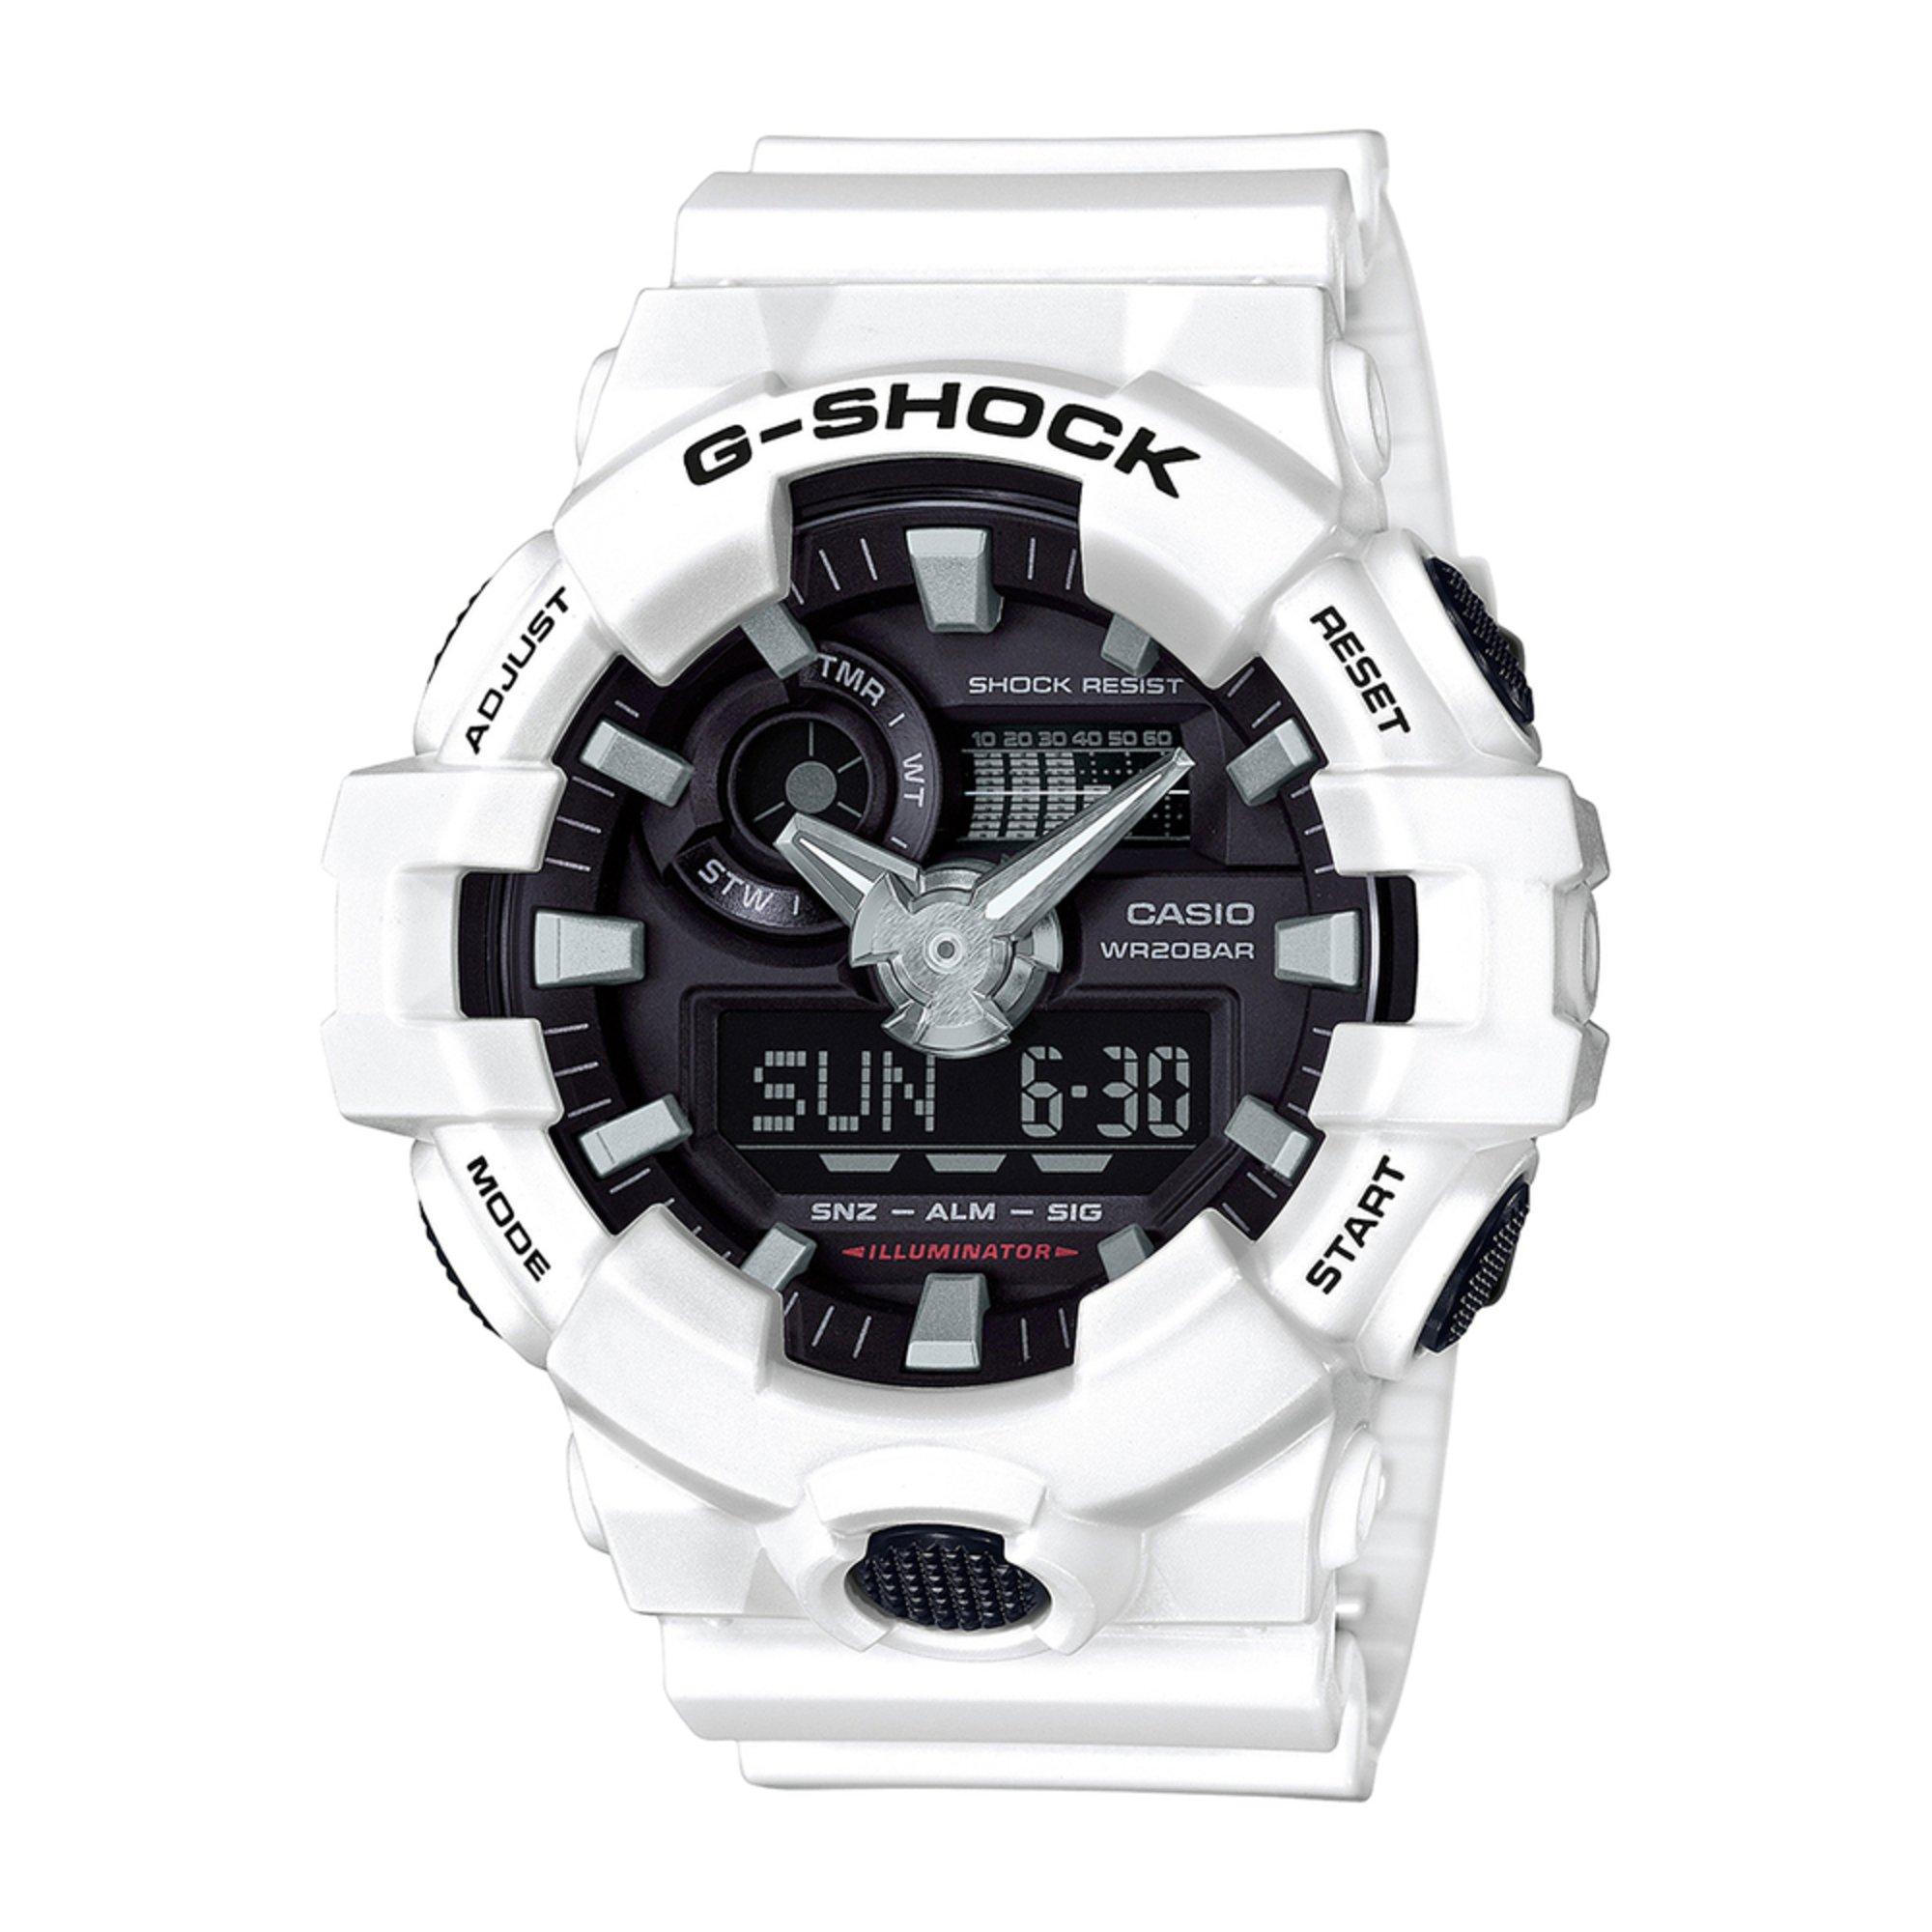 53b4ba7c4d41 Casio Men s G-shock White Analog-digital Watch